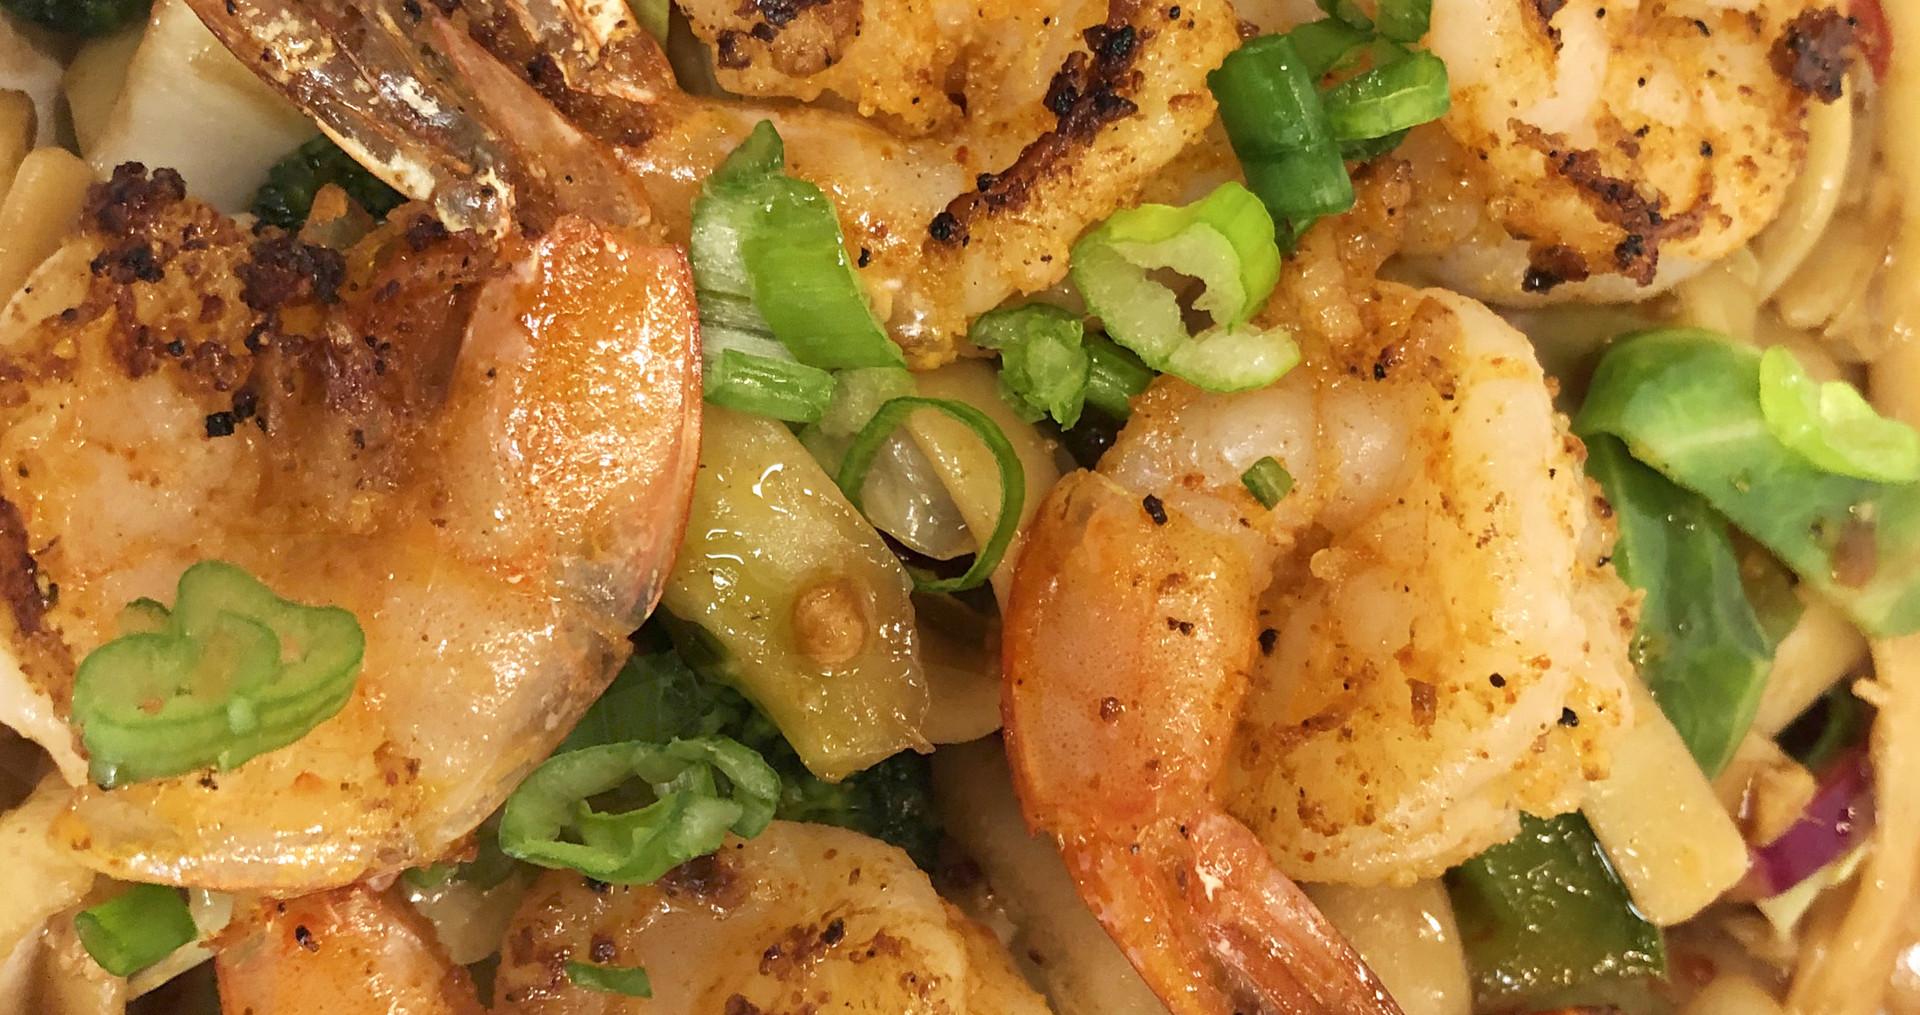 Sweet & Spicy Garden Fettucine with Marinated Shrimp